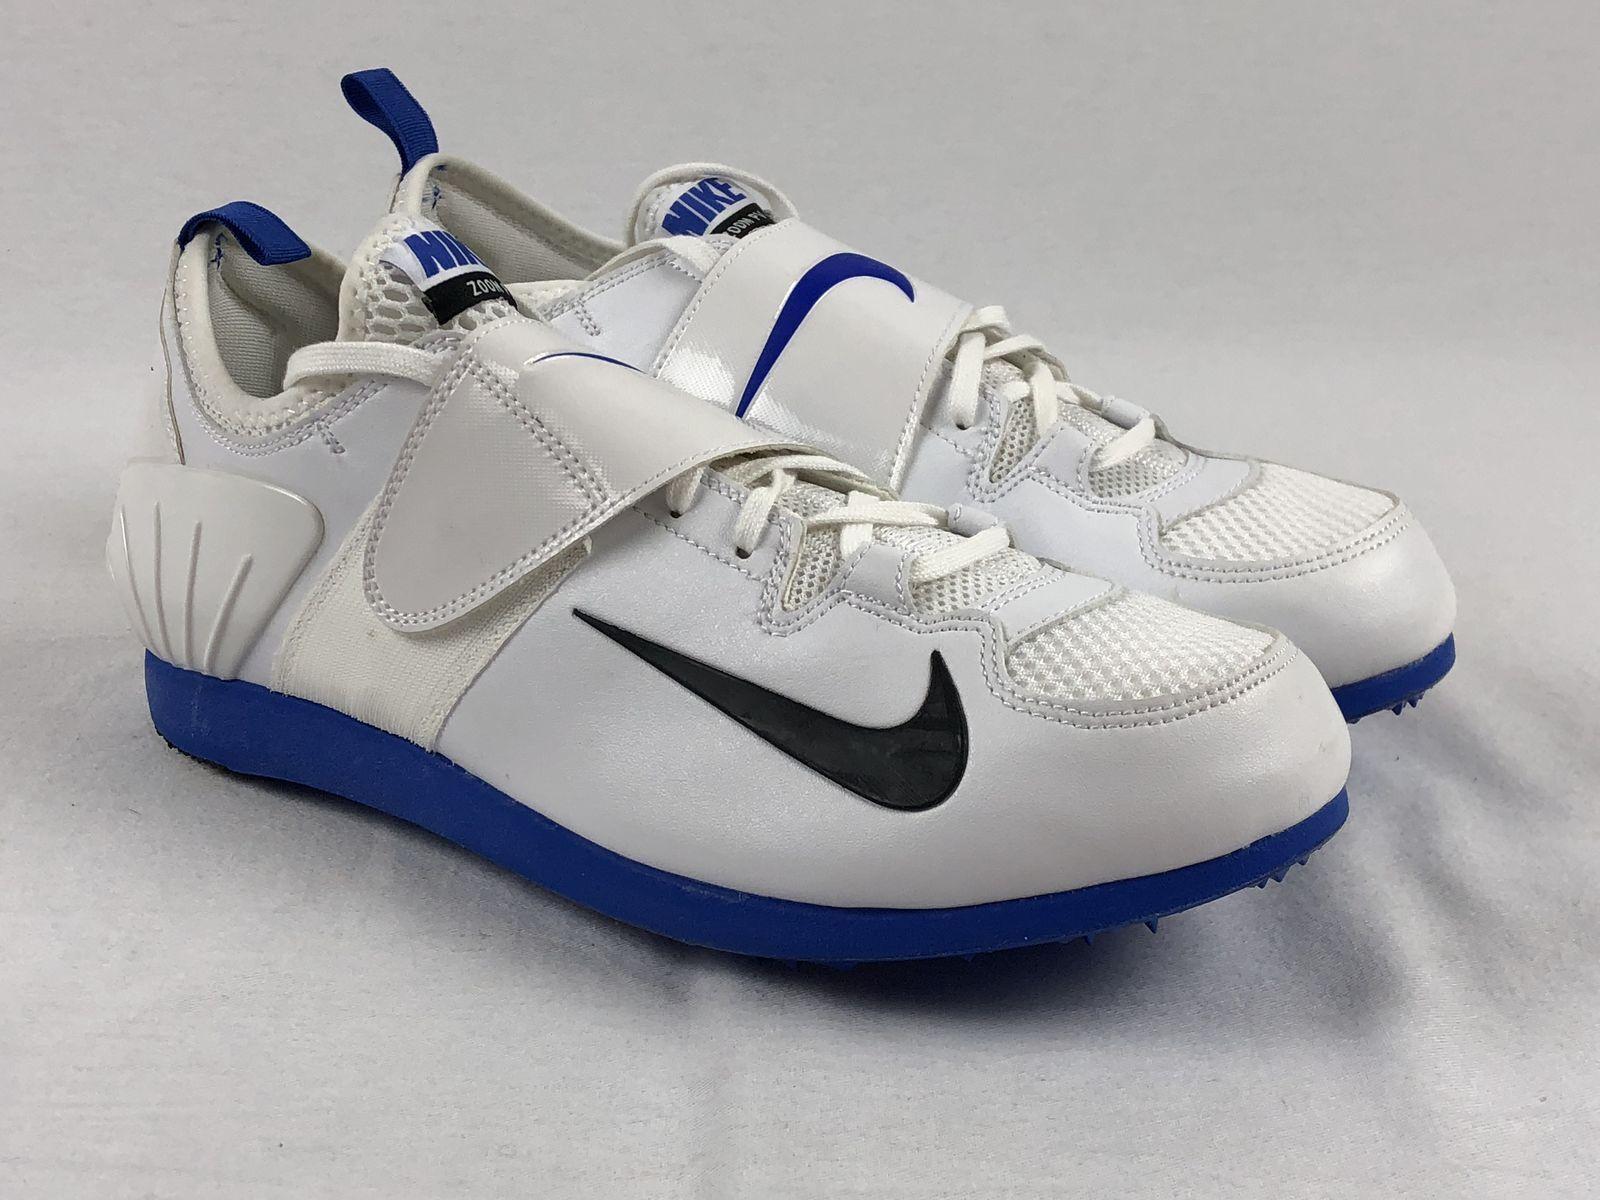 NEW Nike Zoom PV II - White Cleats (Men's 12.5)